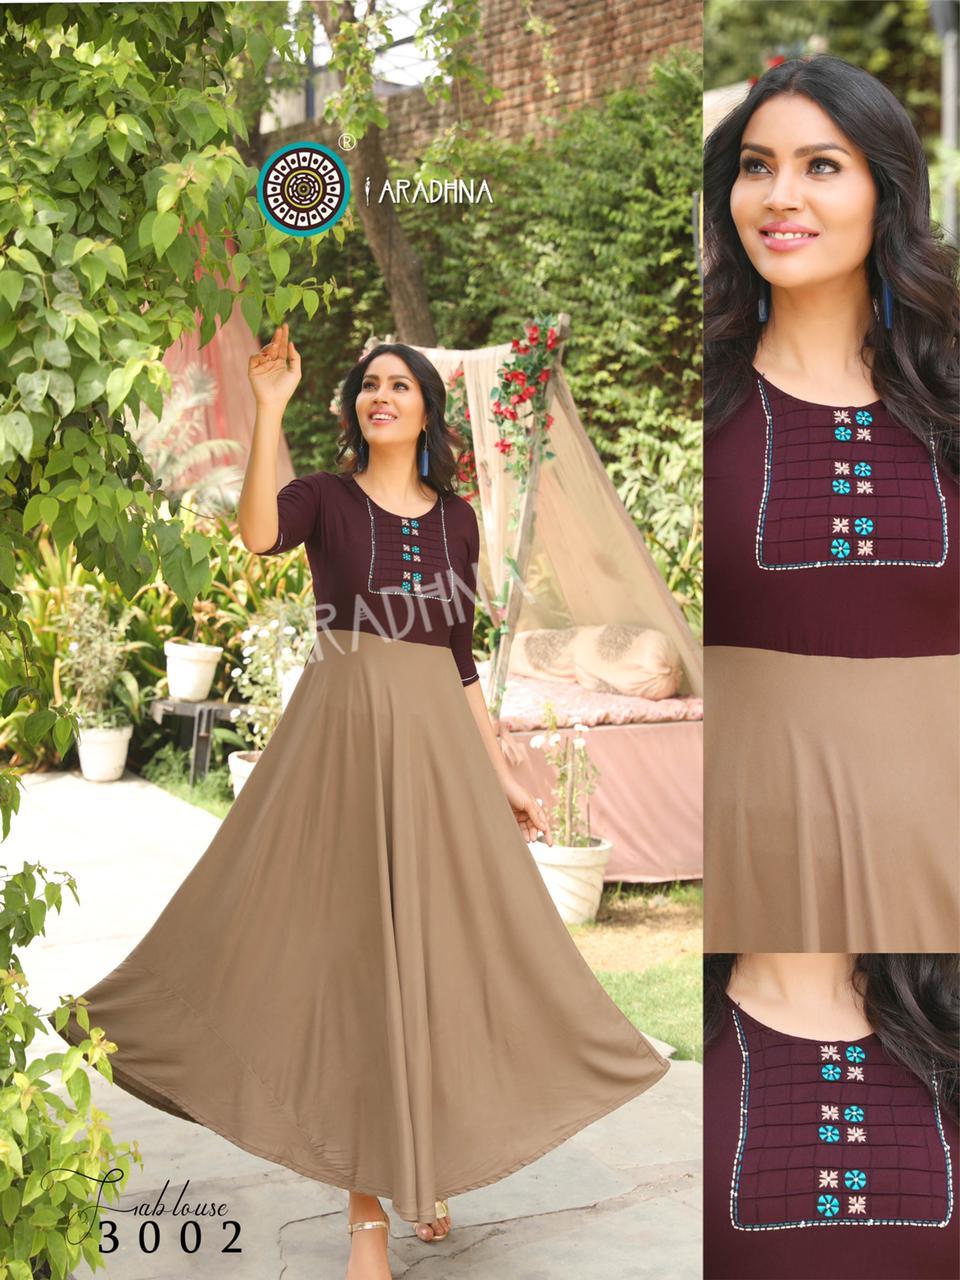 Aradhna Fashion Fabulous Vol 3 Kurti Wholesale Catalog 12 Pcs 4 - Aradhna Fashion Fabulous Vol 3 Kurti Wholesale Catalog 12 Pcs